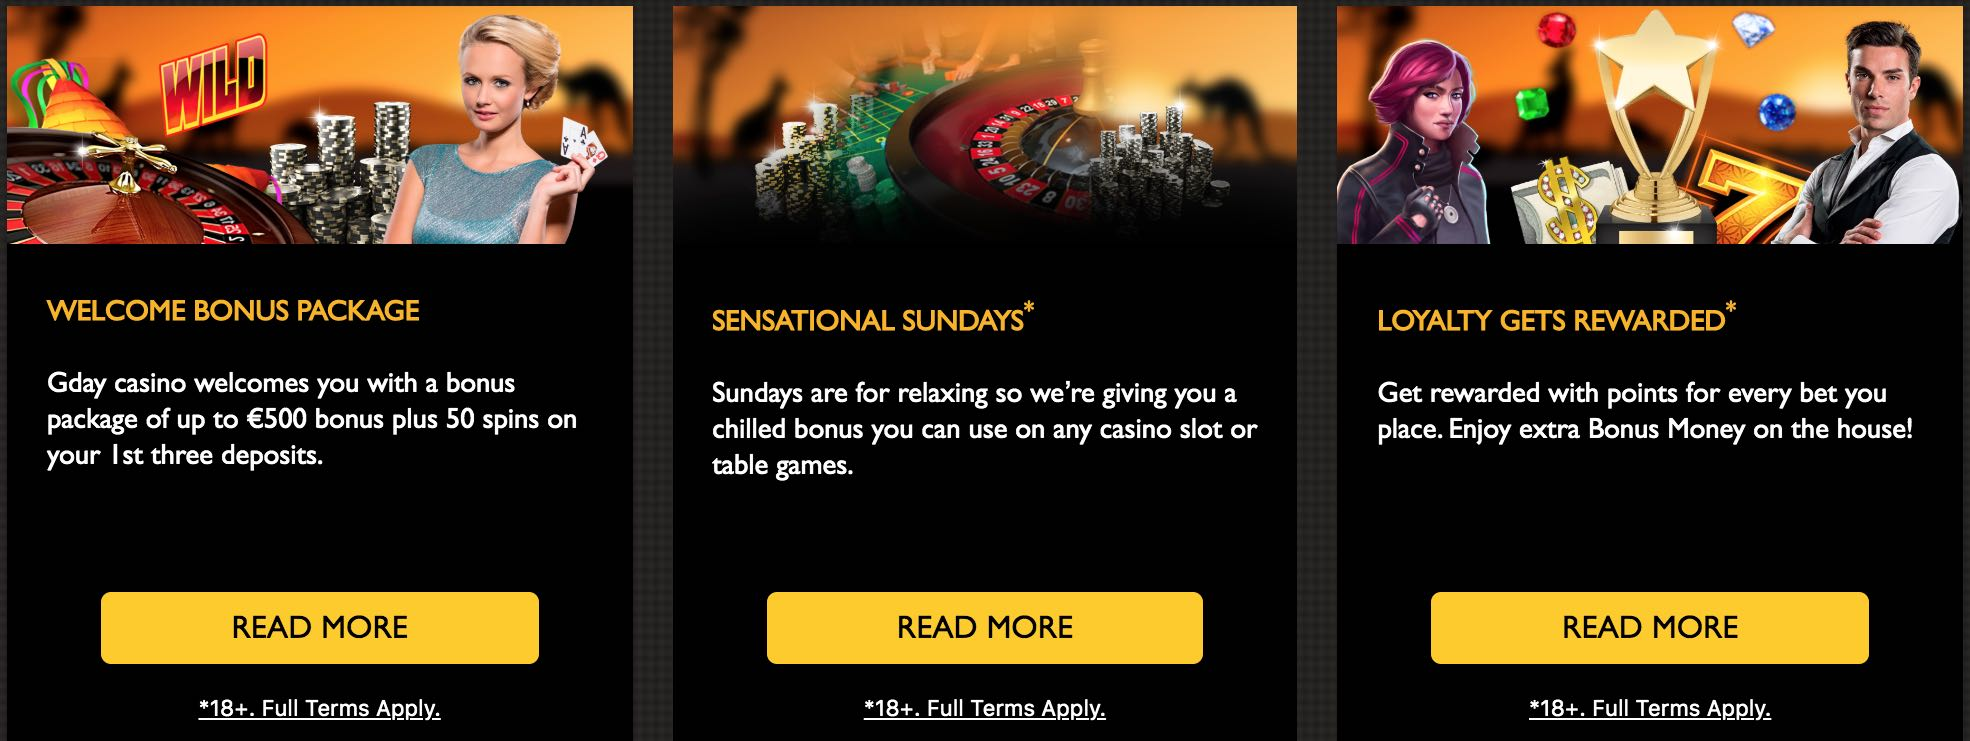 Gday Casino Bonus Codes – GDayCasino.com Free Spins September 2020